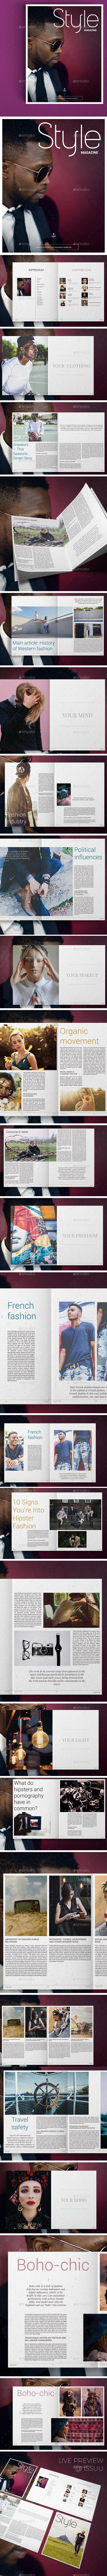 Style - fashion magazine - Magazines Print Templates